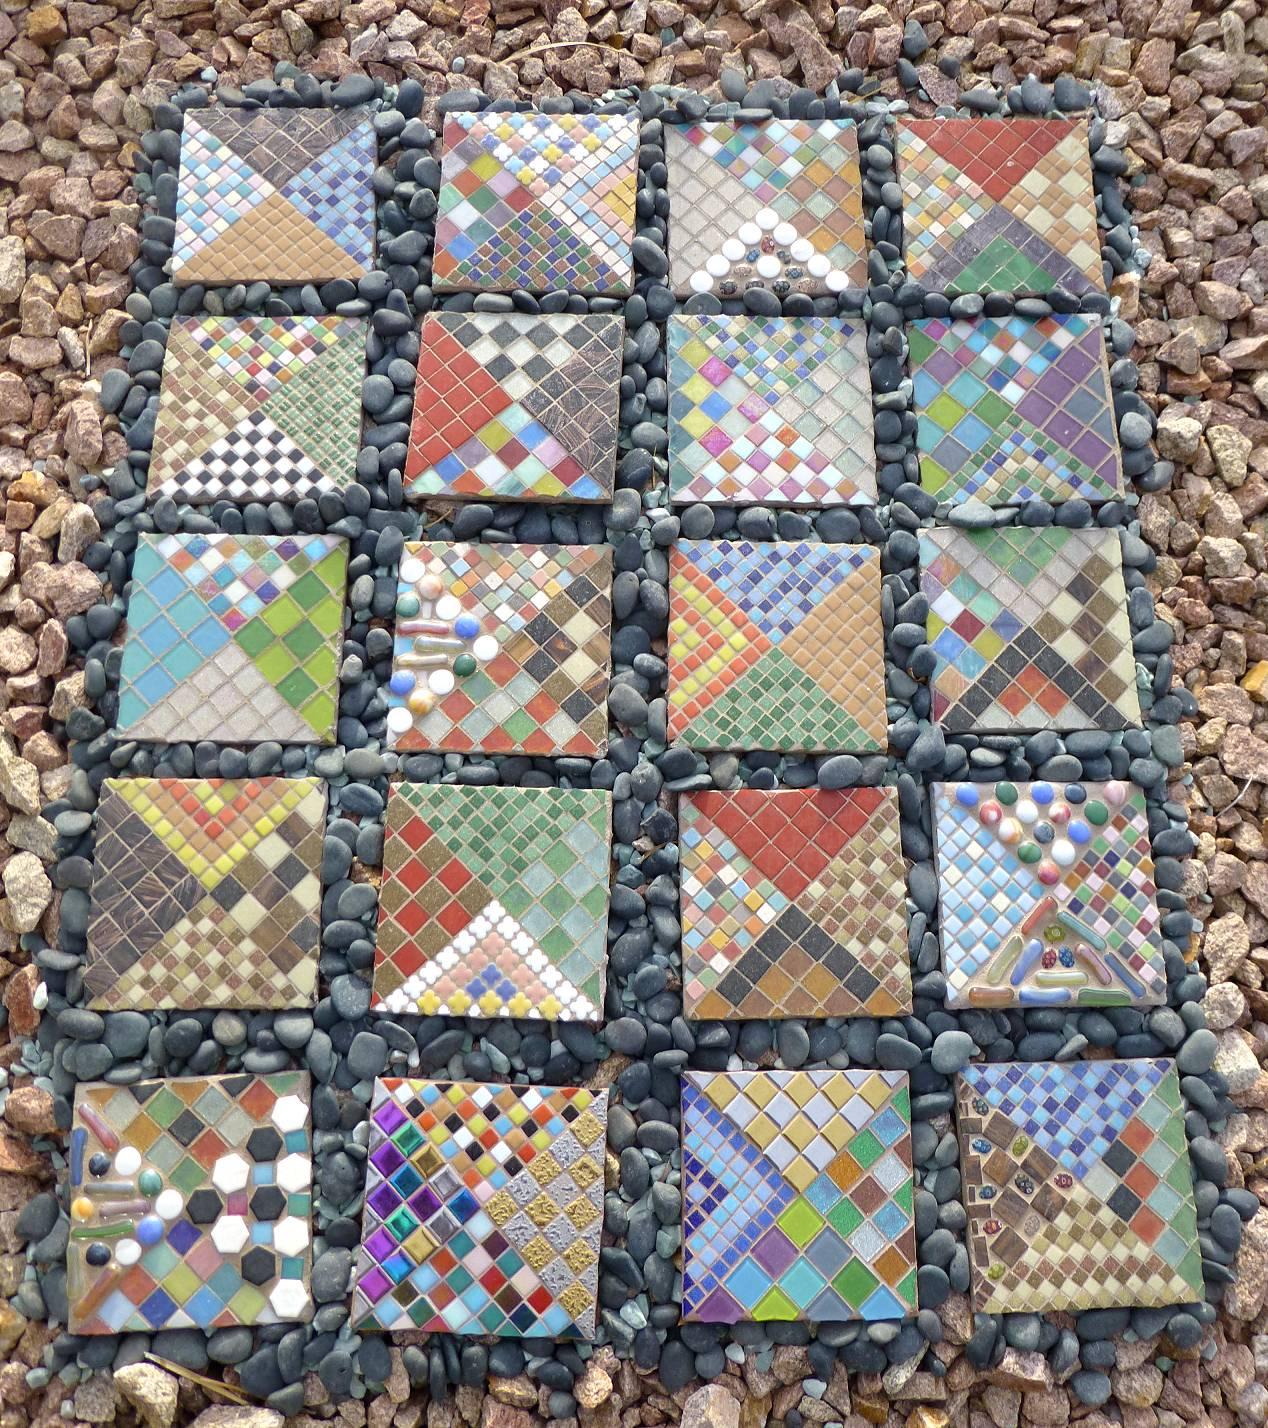 Mosaic Quilt by Franki Roizman